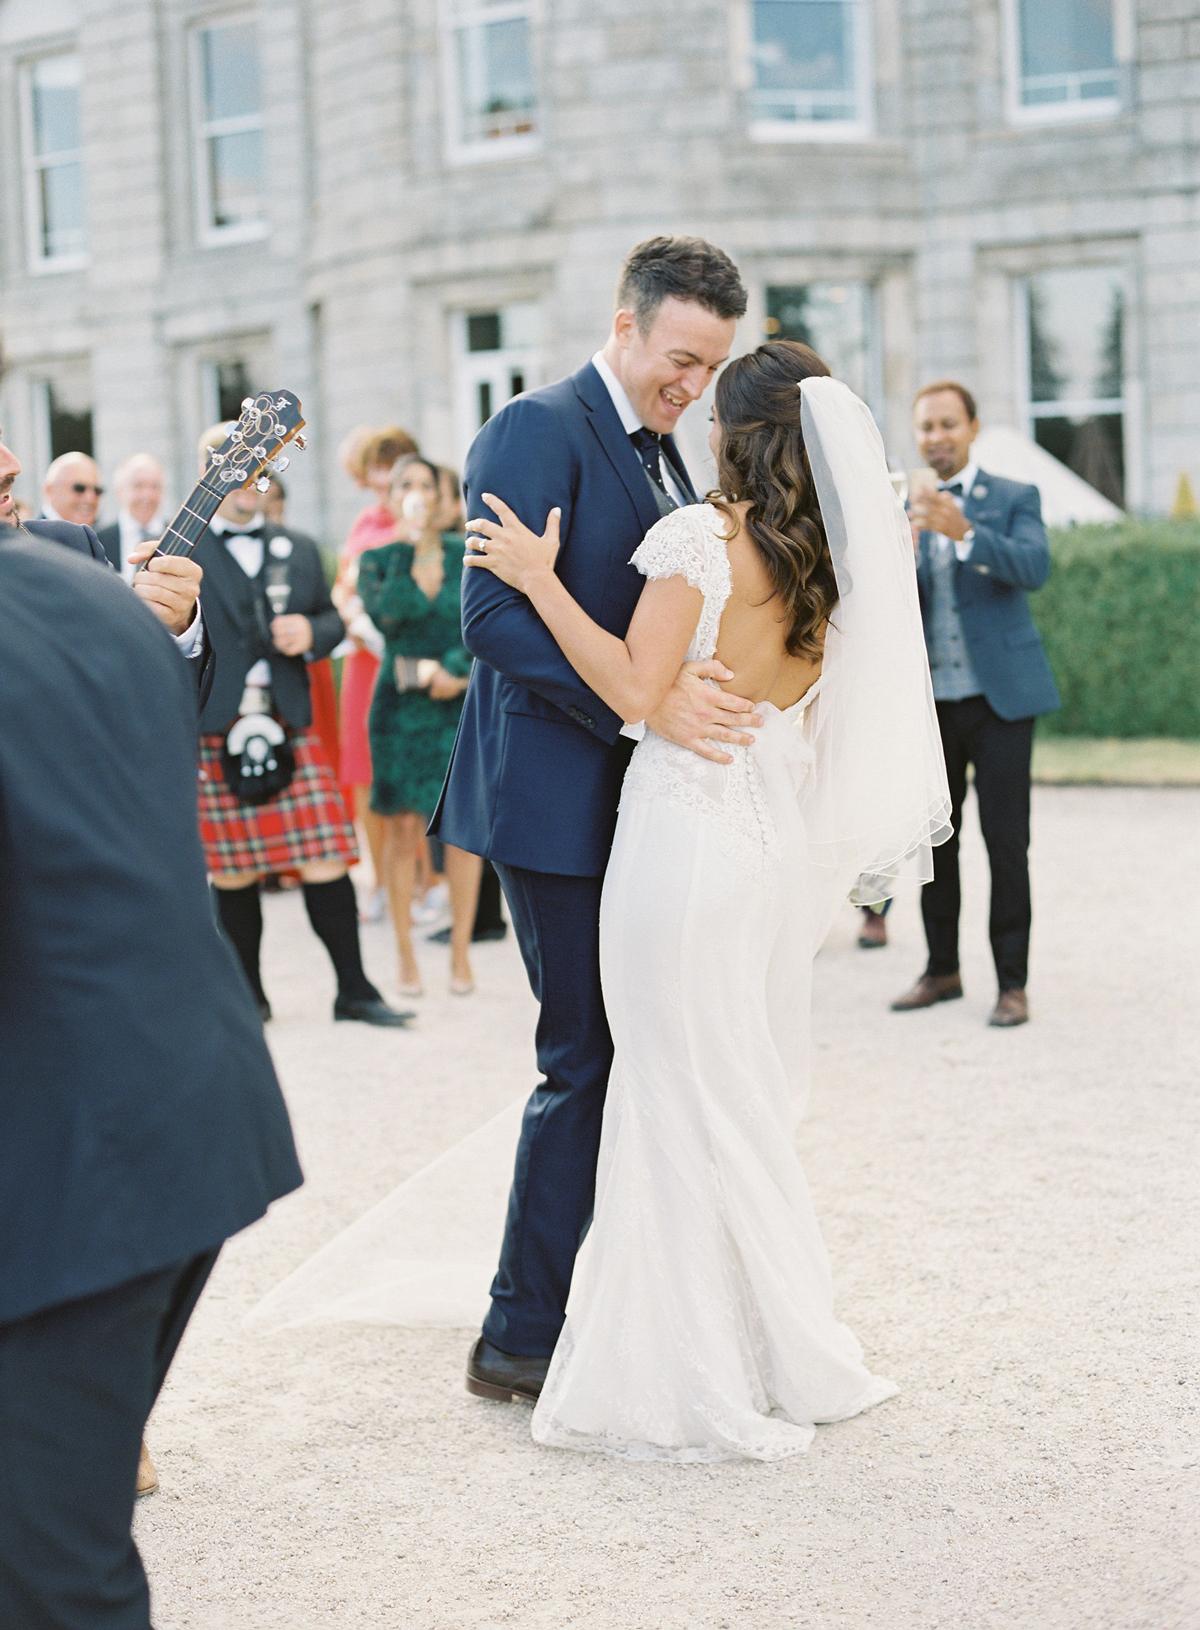 bride and groom dancing outside wedding venue